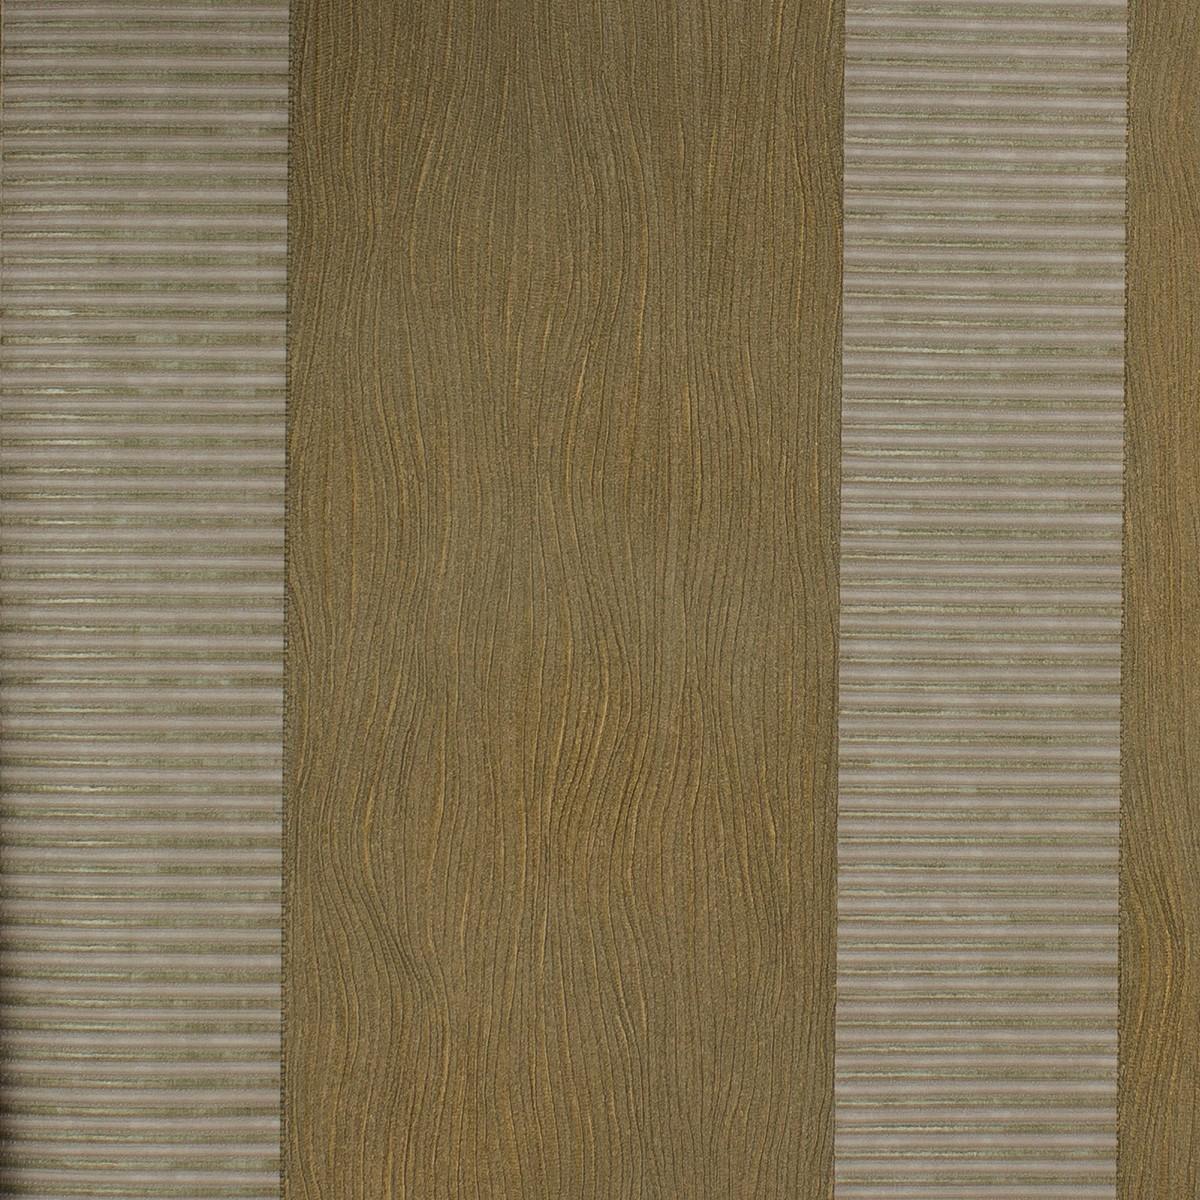 luigi colani visions vliestapete marburg tapete 53348. Black Bedroom Furniture Sets. Home Design Ideas